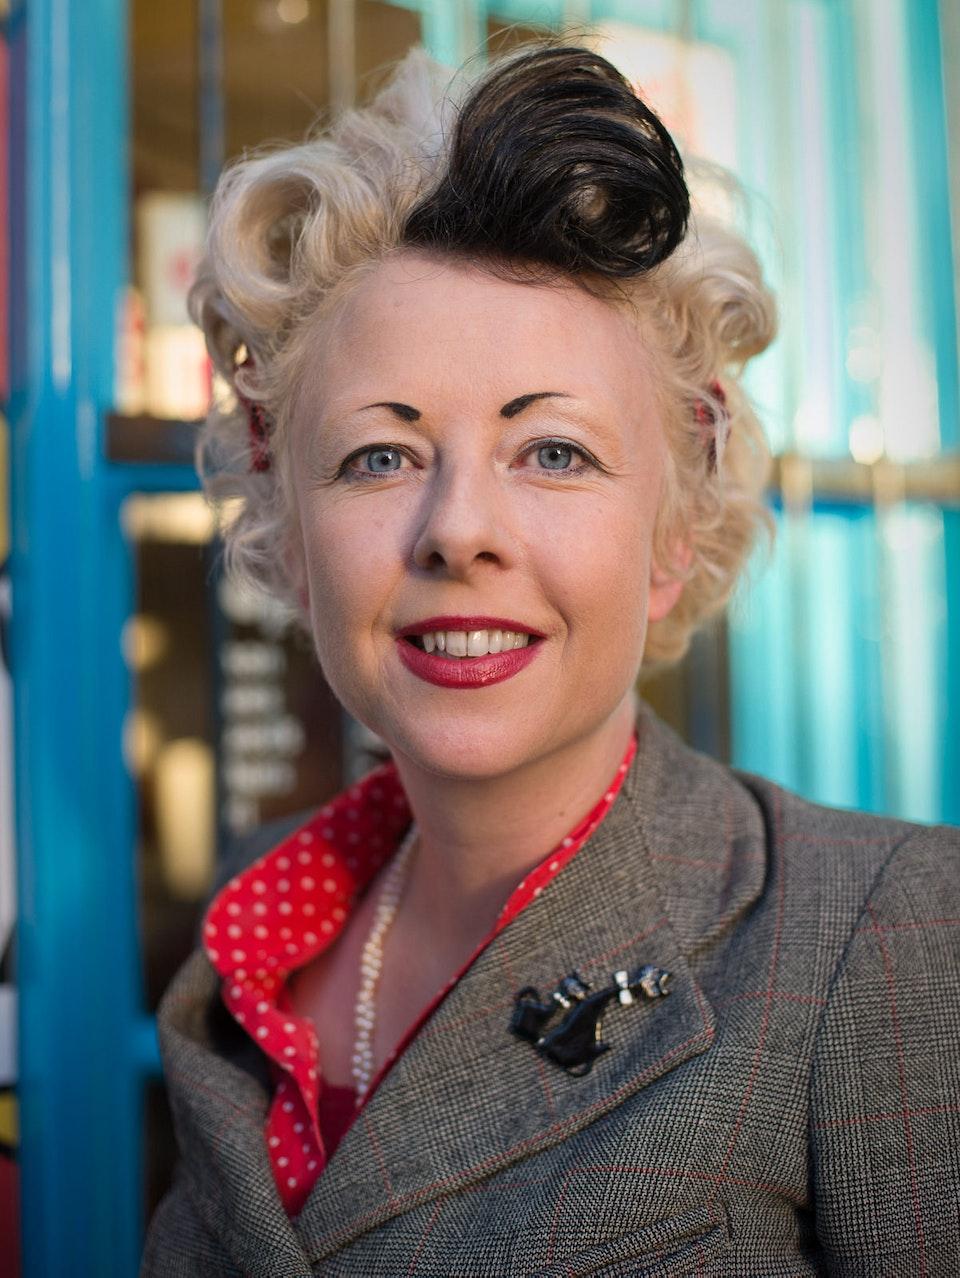 Portraits - Cathi Unsworth, Author